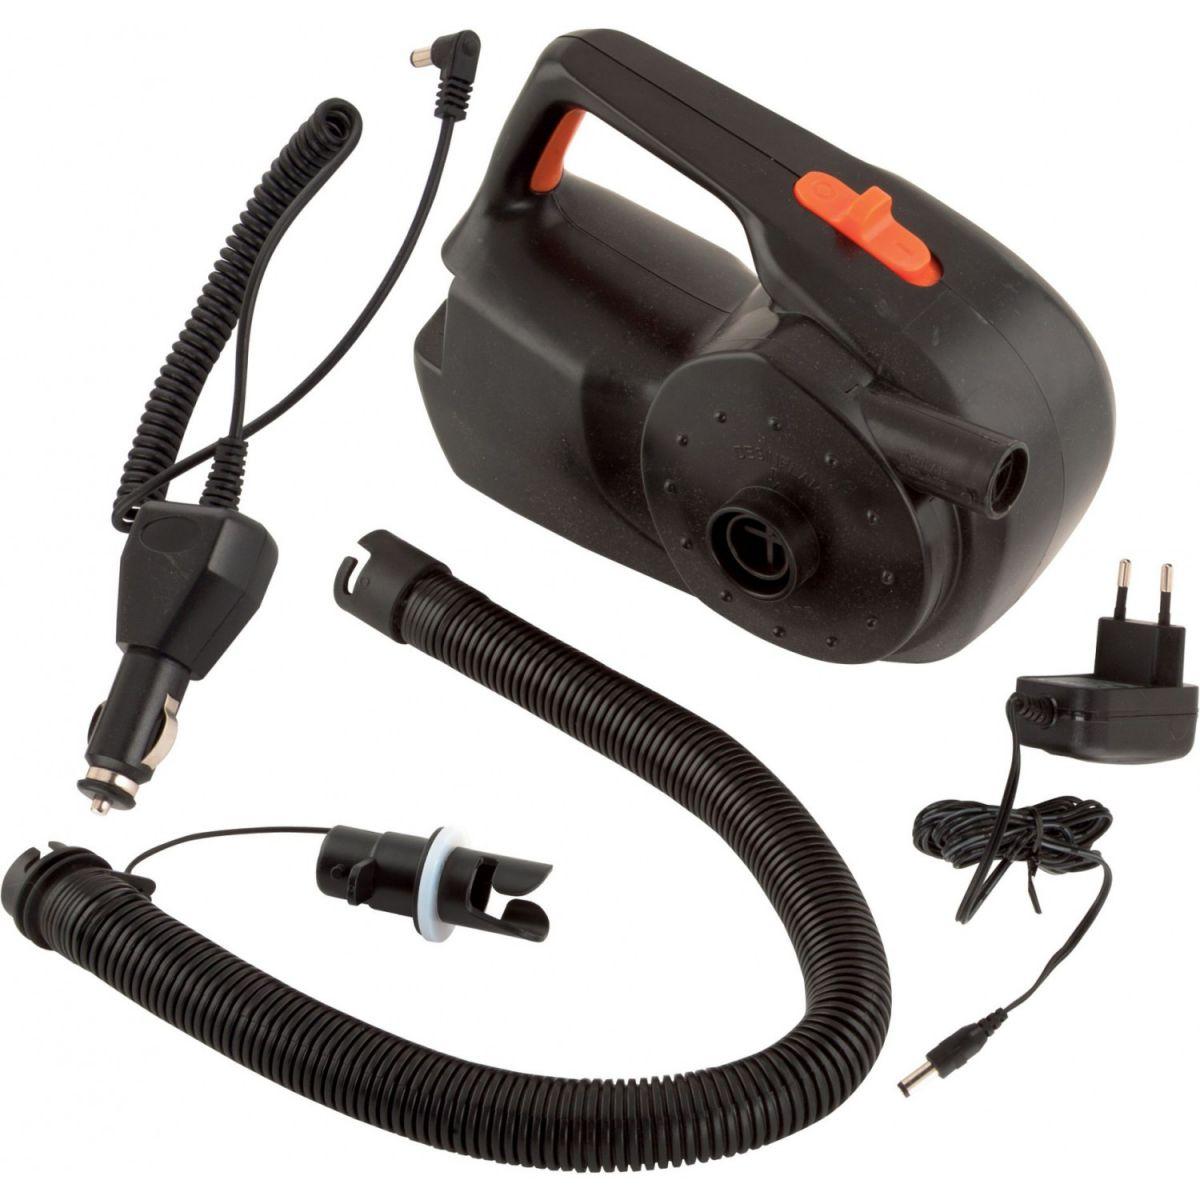 /produkty/106/plavajuce-vesty-a-doplnky/Fox/Pumpa-Rechargable-Air-PumpDeflator-12V240V